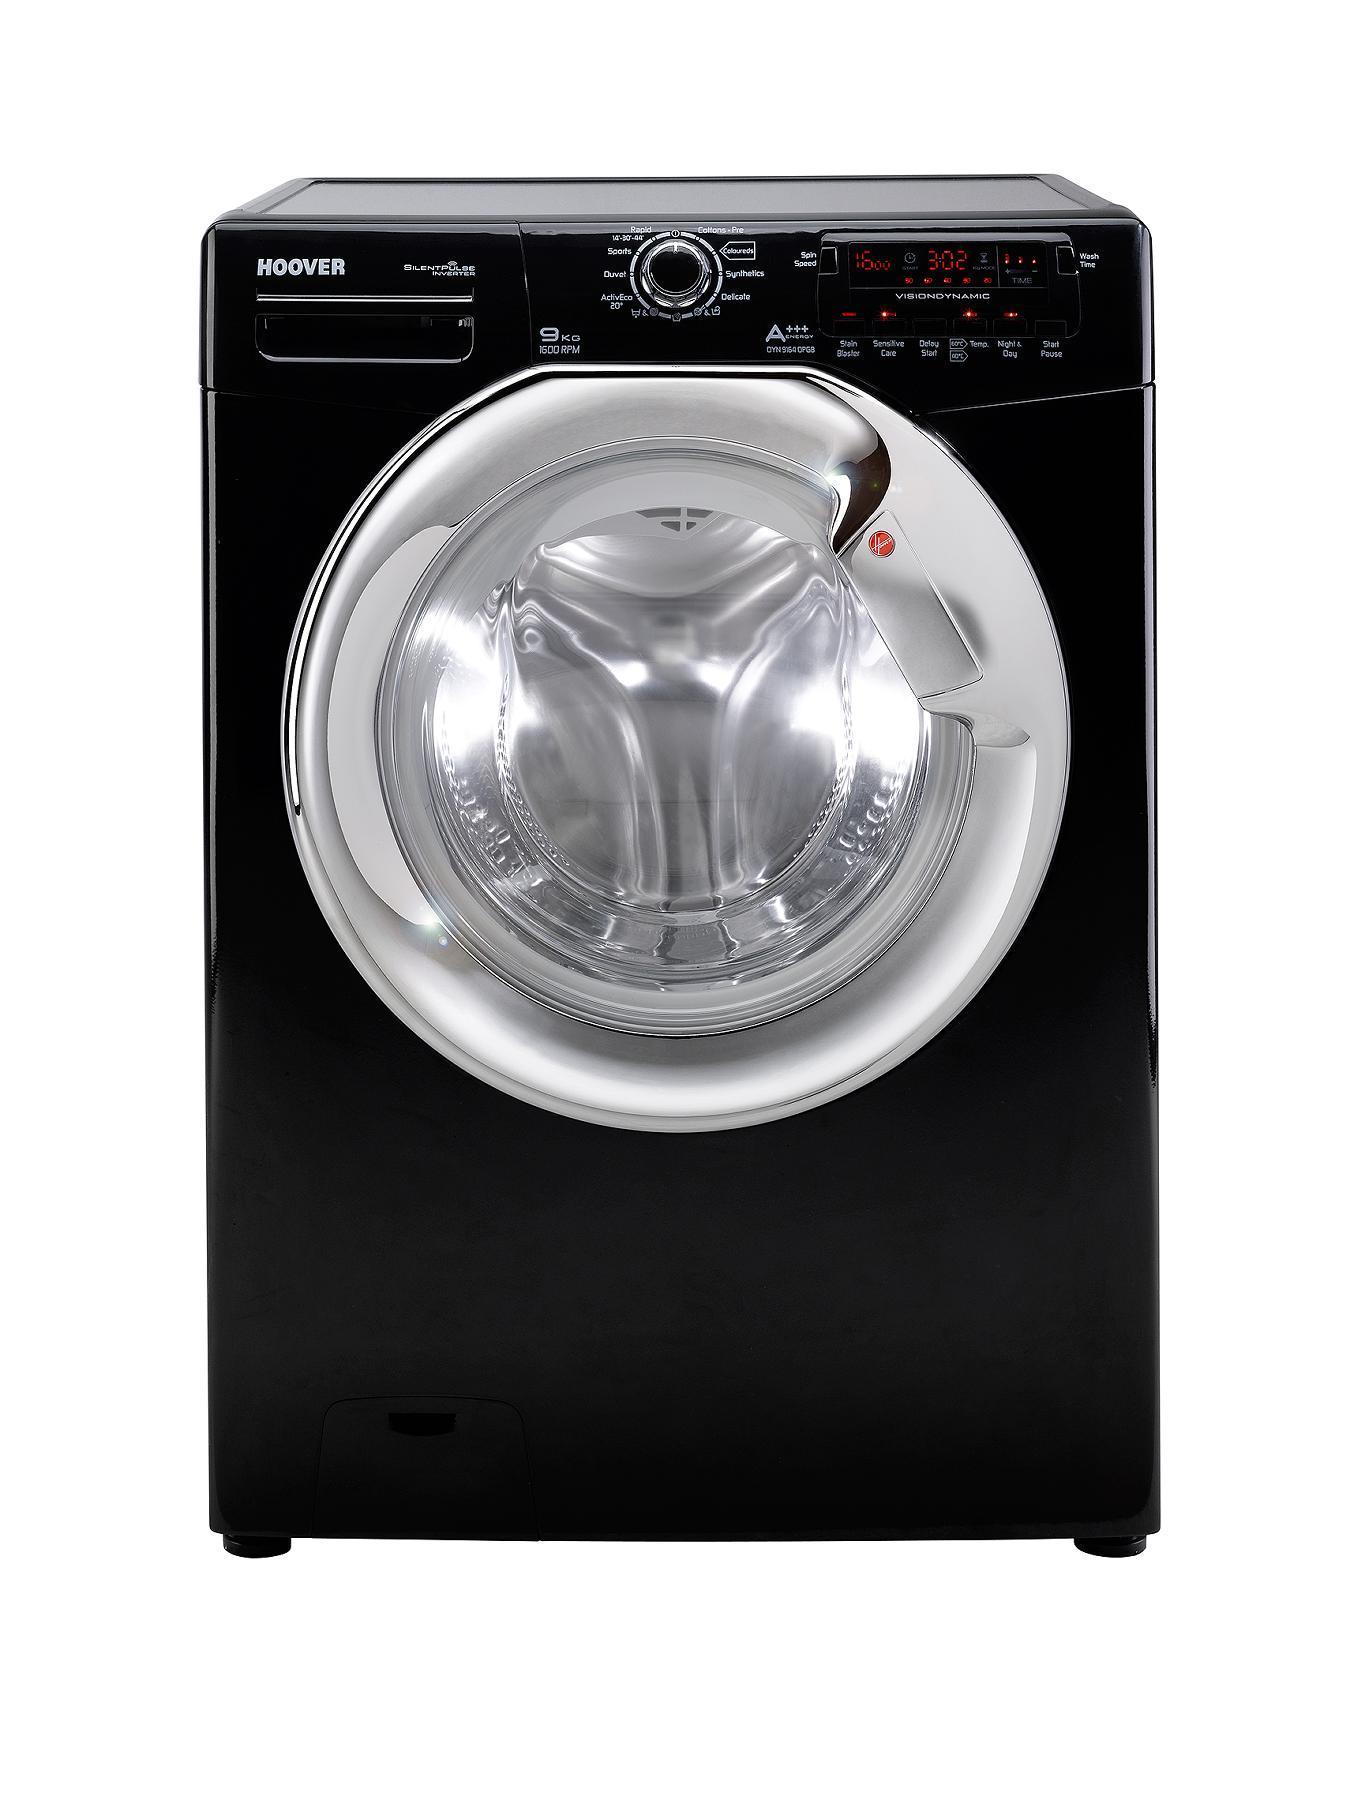 black washing machine shop for cheap washing machines. Black Bedroom Furniture Sets. Home Design Ideas